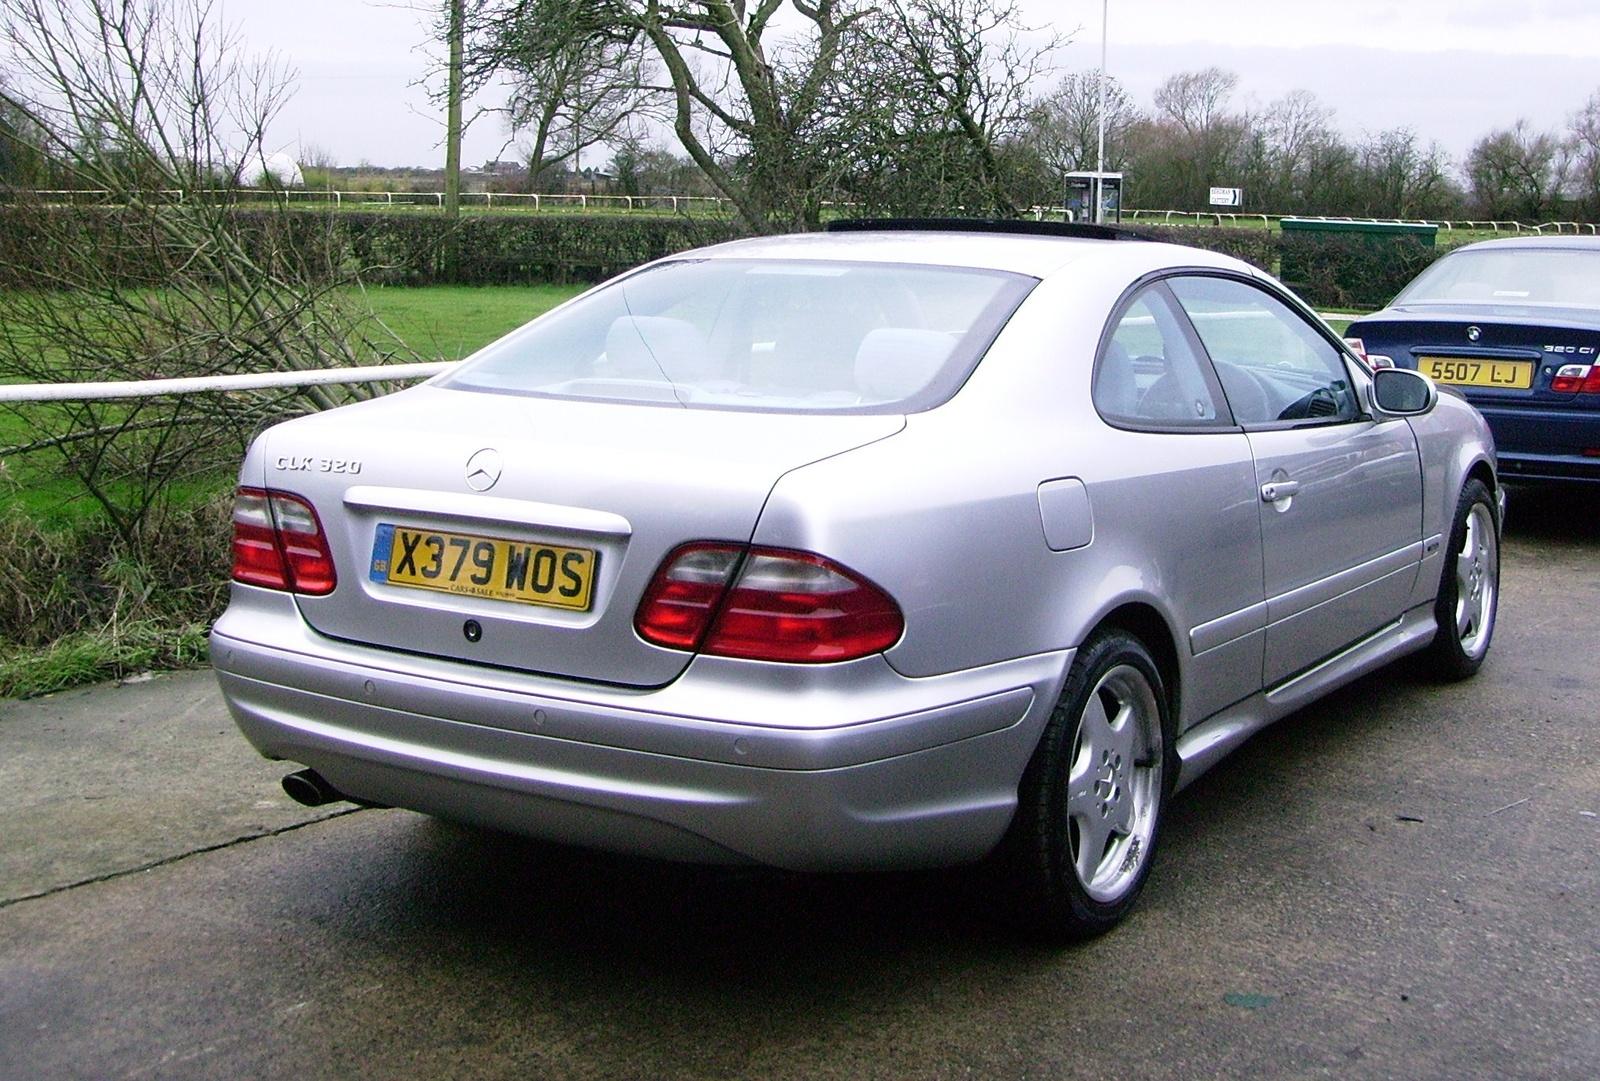 2001 mercedes benz clk class exterior pictures cargurus for Mercedes benz clk320